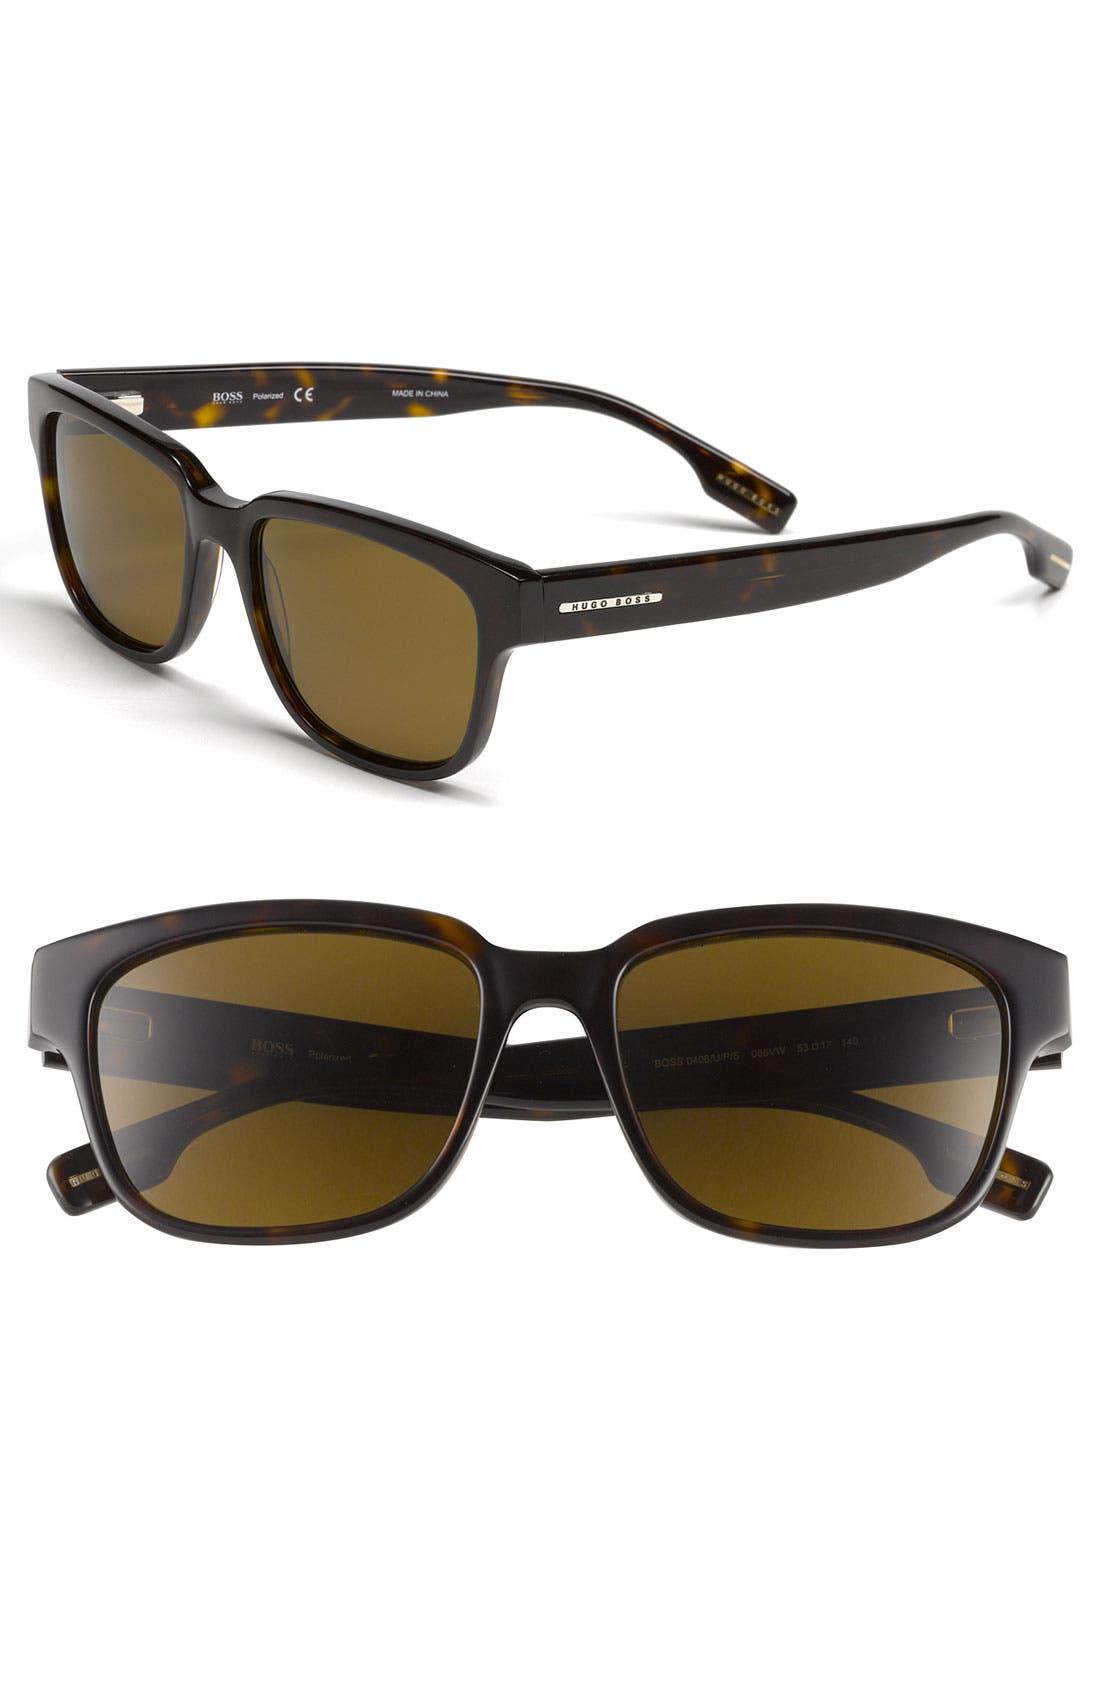 Main Image - BOSS HUGO BOSS 53mm Polarized Sunglasses